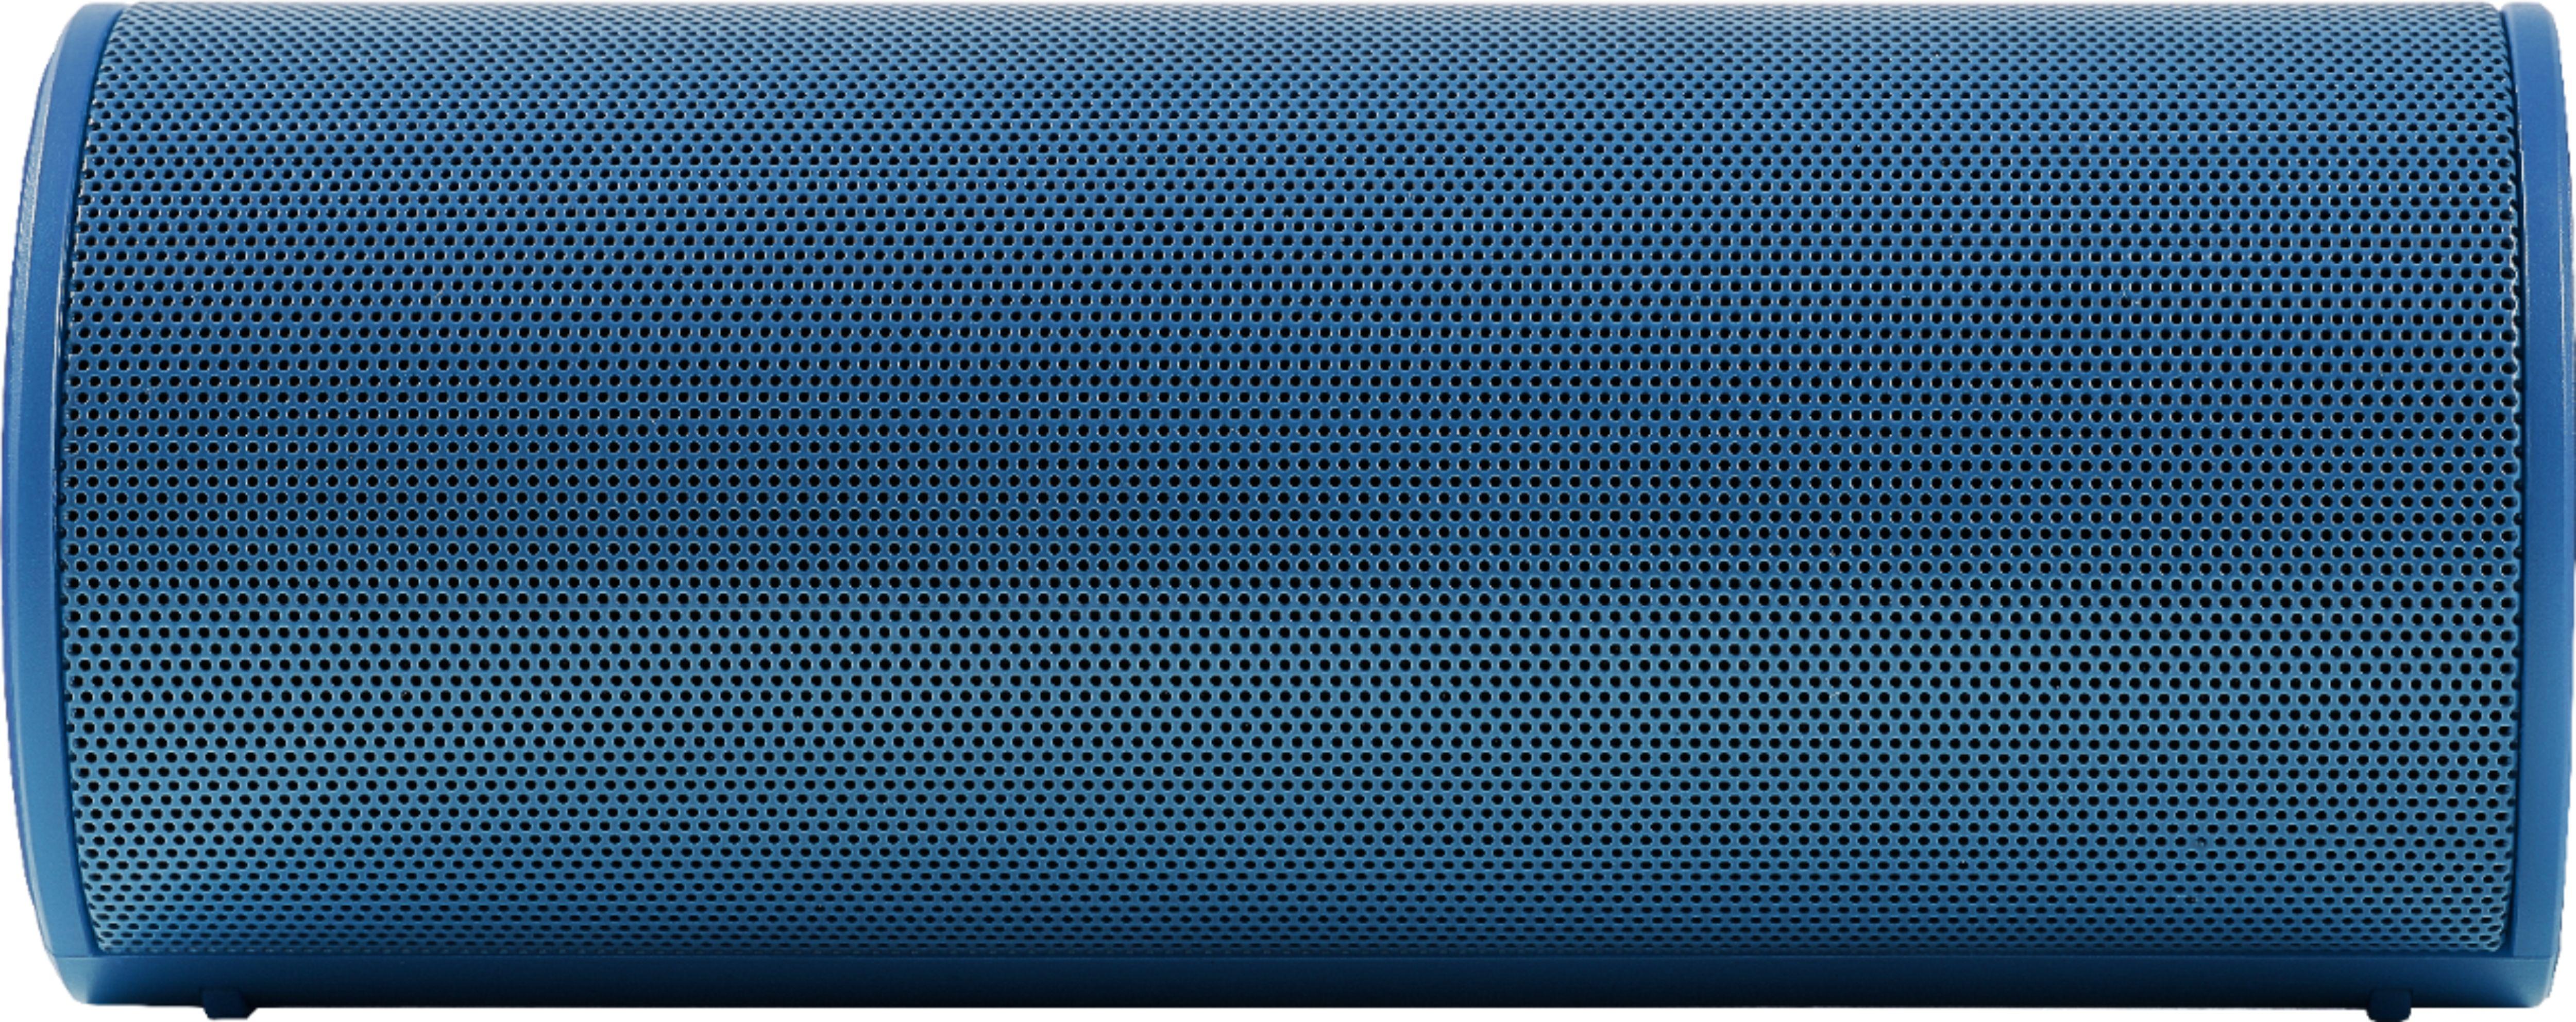 Insignia WAVE 2 Portable Bluetooth Speaker Blue NS SPBTWAVE2 BL Best Buy